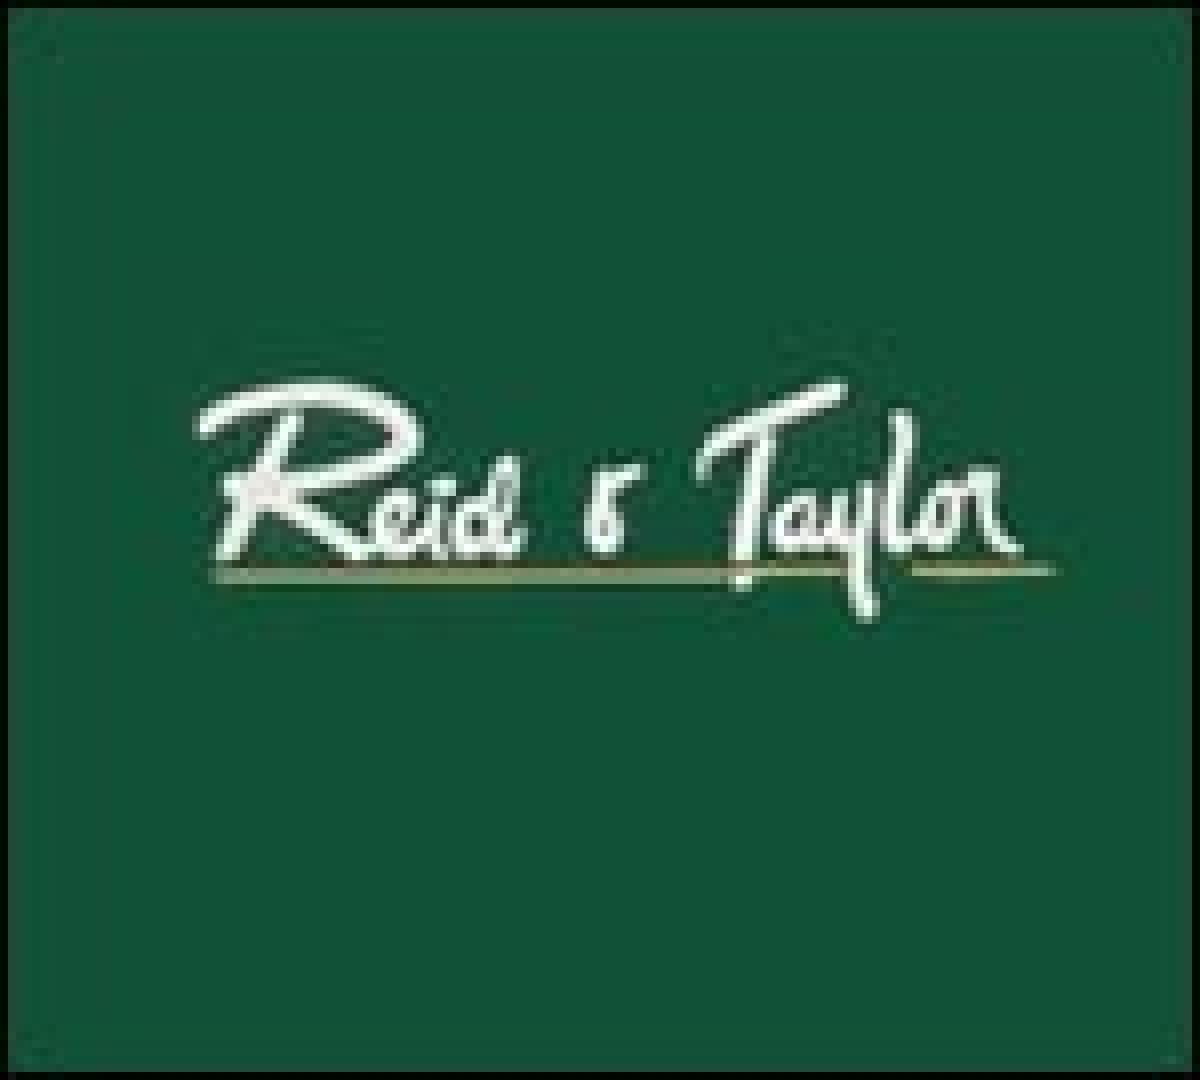 ideas@work retains Reid & Taylor account